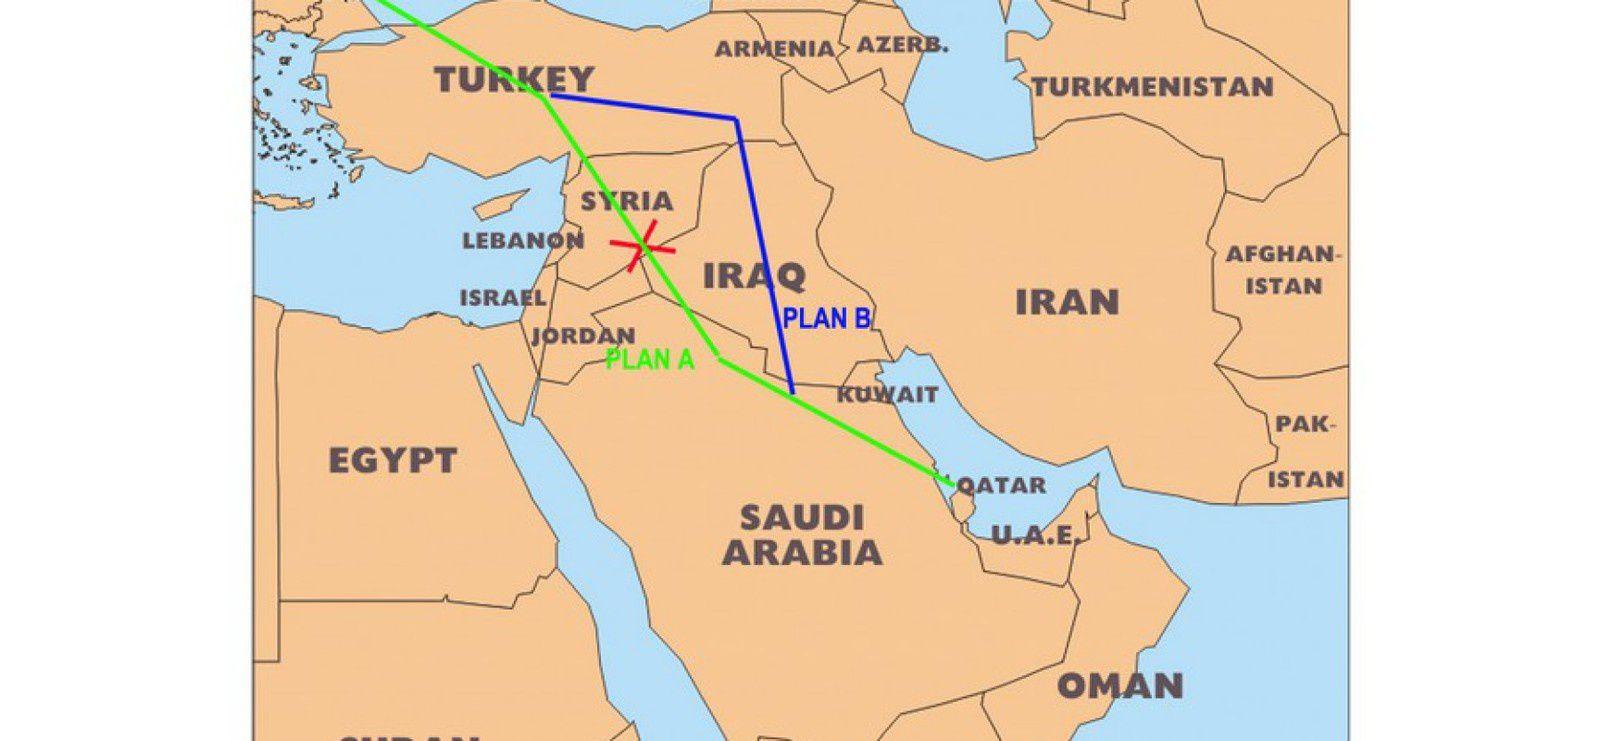 Qatar Airways suspend tous ses vols sur l'Arabie saoudite (AFP)